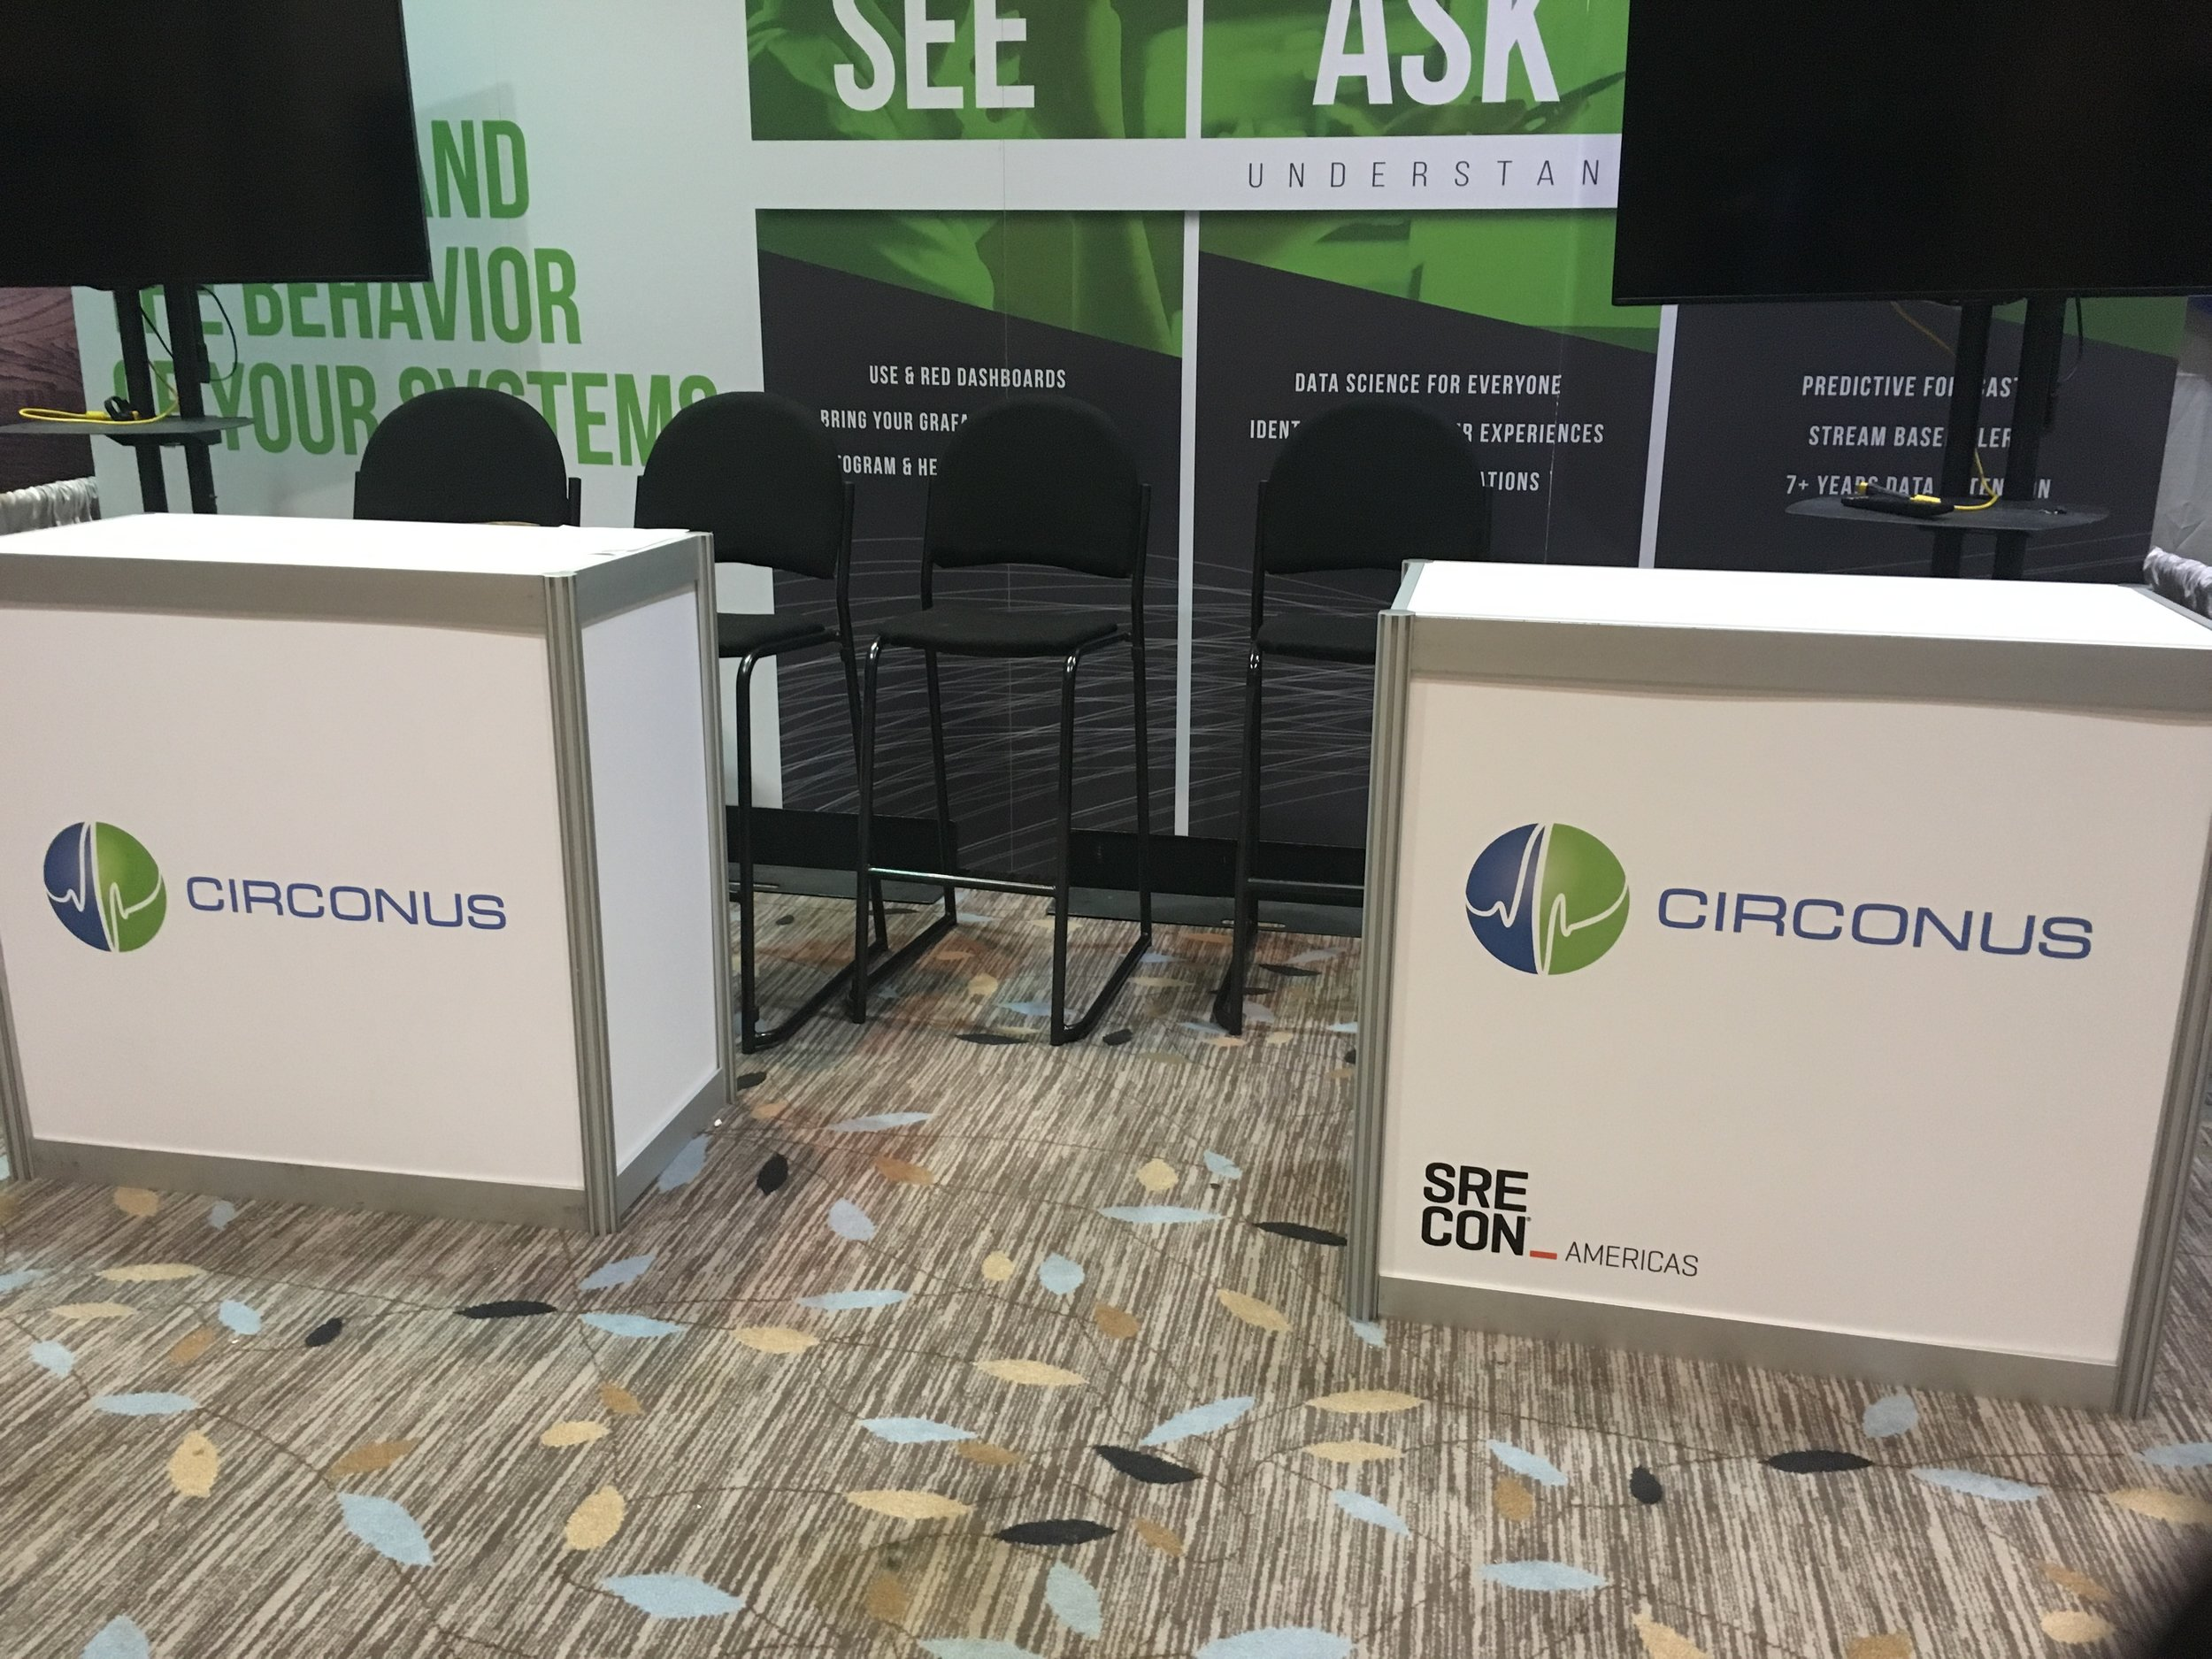 USENIX.2018.kiosk.backwall.JPG